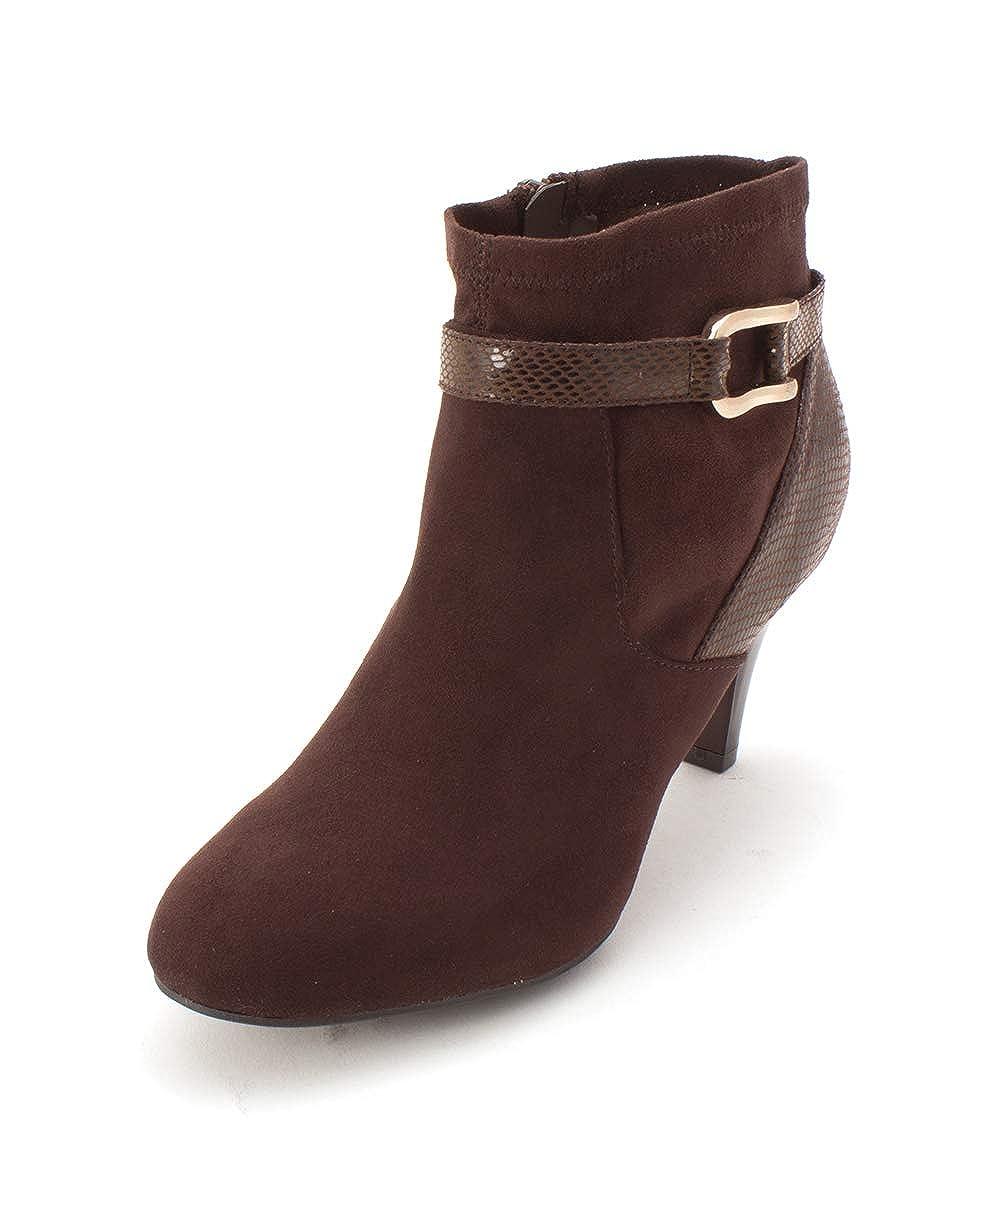 2bc5cb44ac9378 Karen Scott Scott Karen Frauen maxinee Geschlossener Zeh Fashion Stiefel  31982c